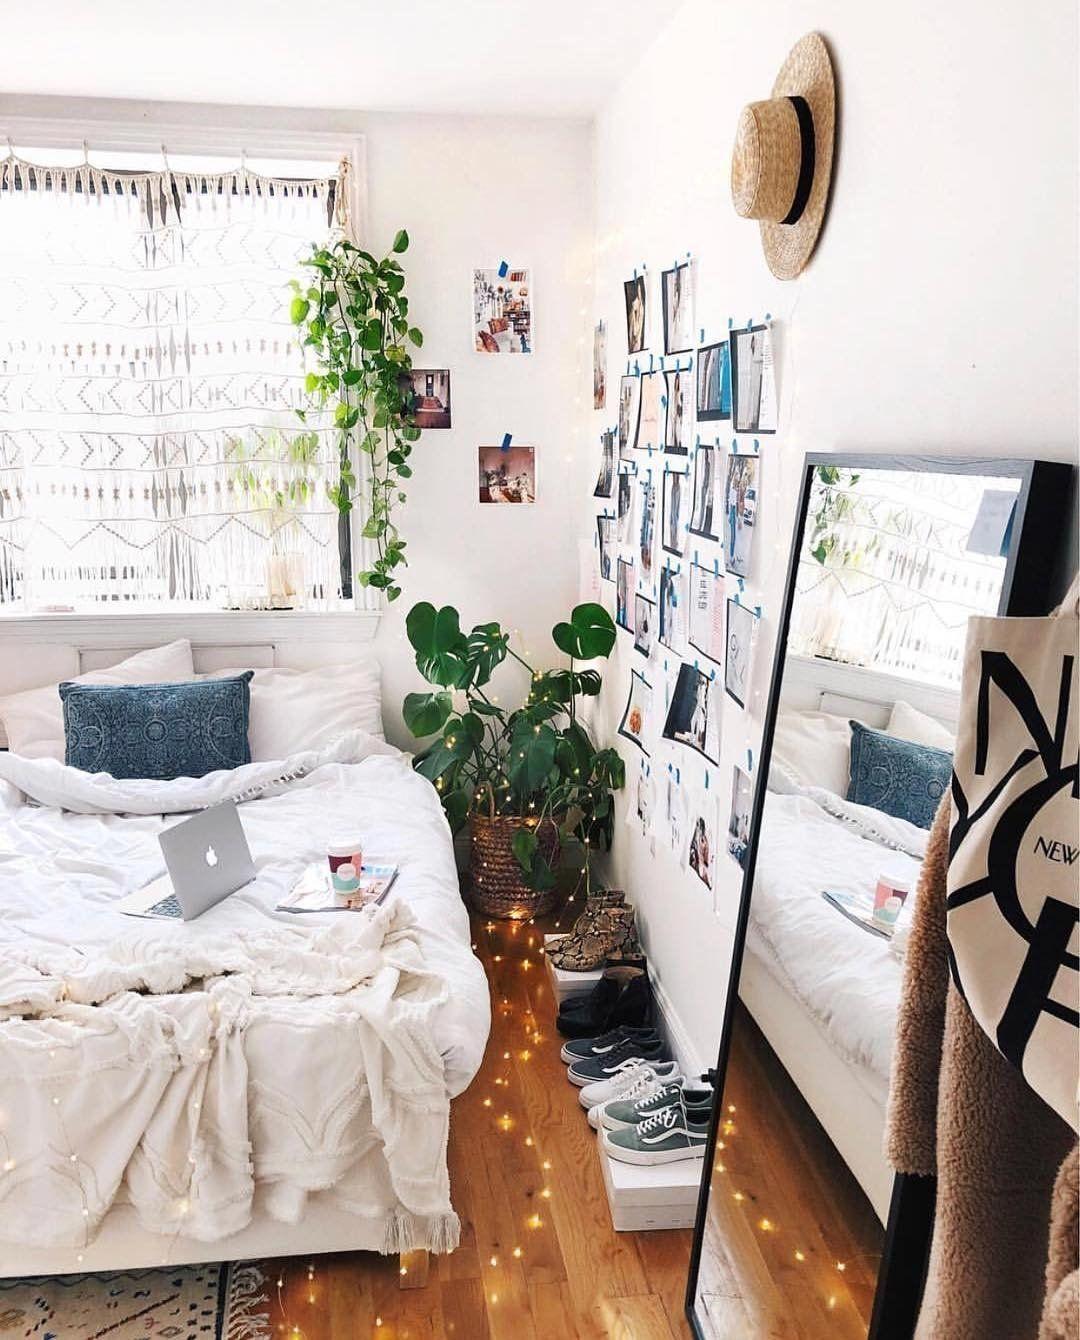 urban outfitters bedroom ideas interior pinterest bedroom